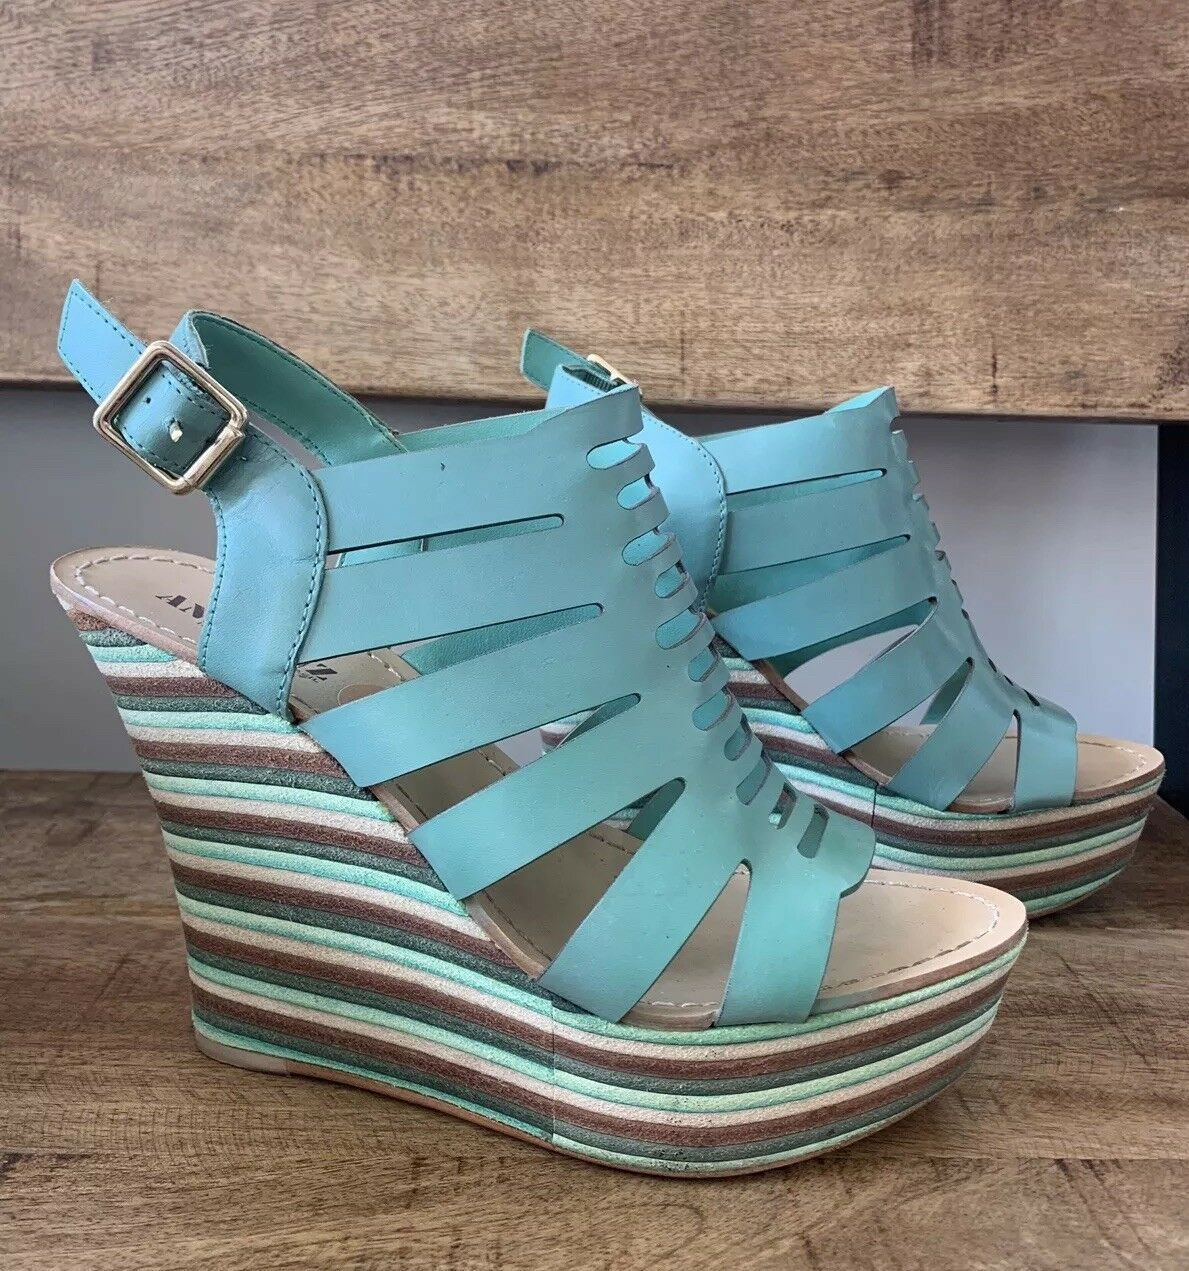 Anna Luz Teal Blau Grün Leather Open Toe Wedge Sandals Handmade Brazil US 7